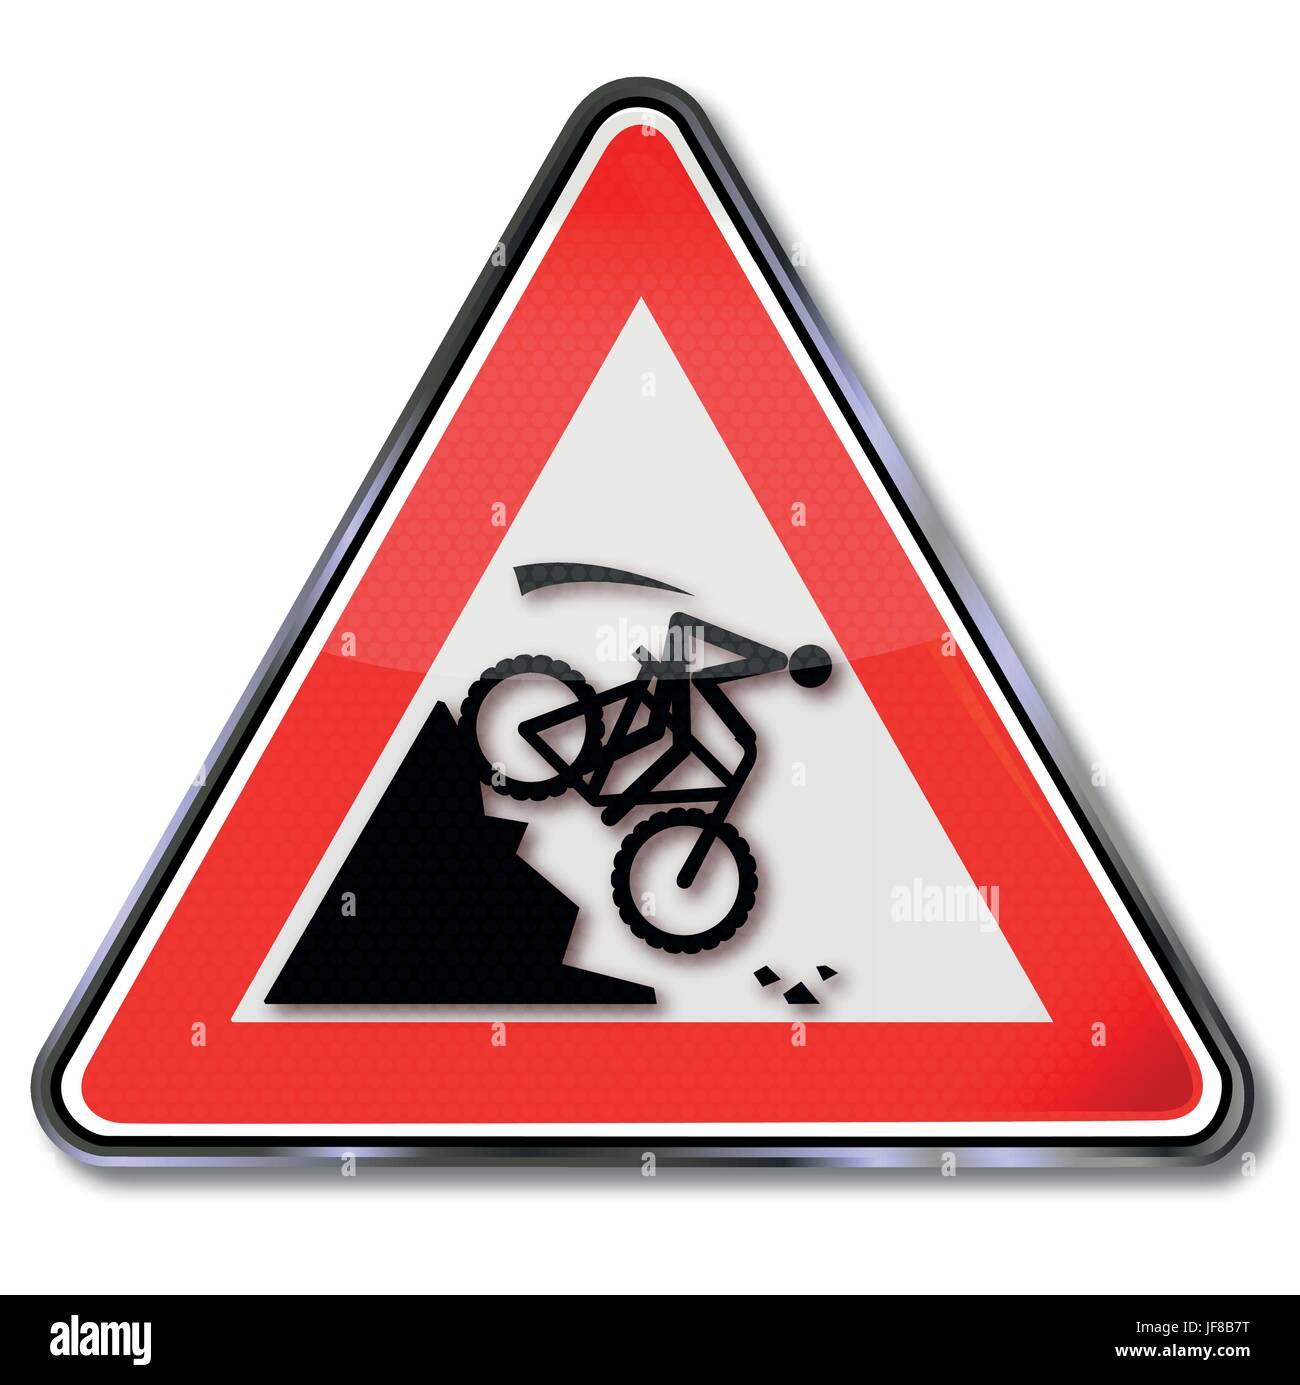 danger, extreme haven, mountainbike, bike, bicycle, cycle, crash, schuss, roll - Stock Image